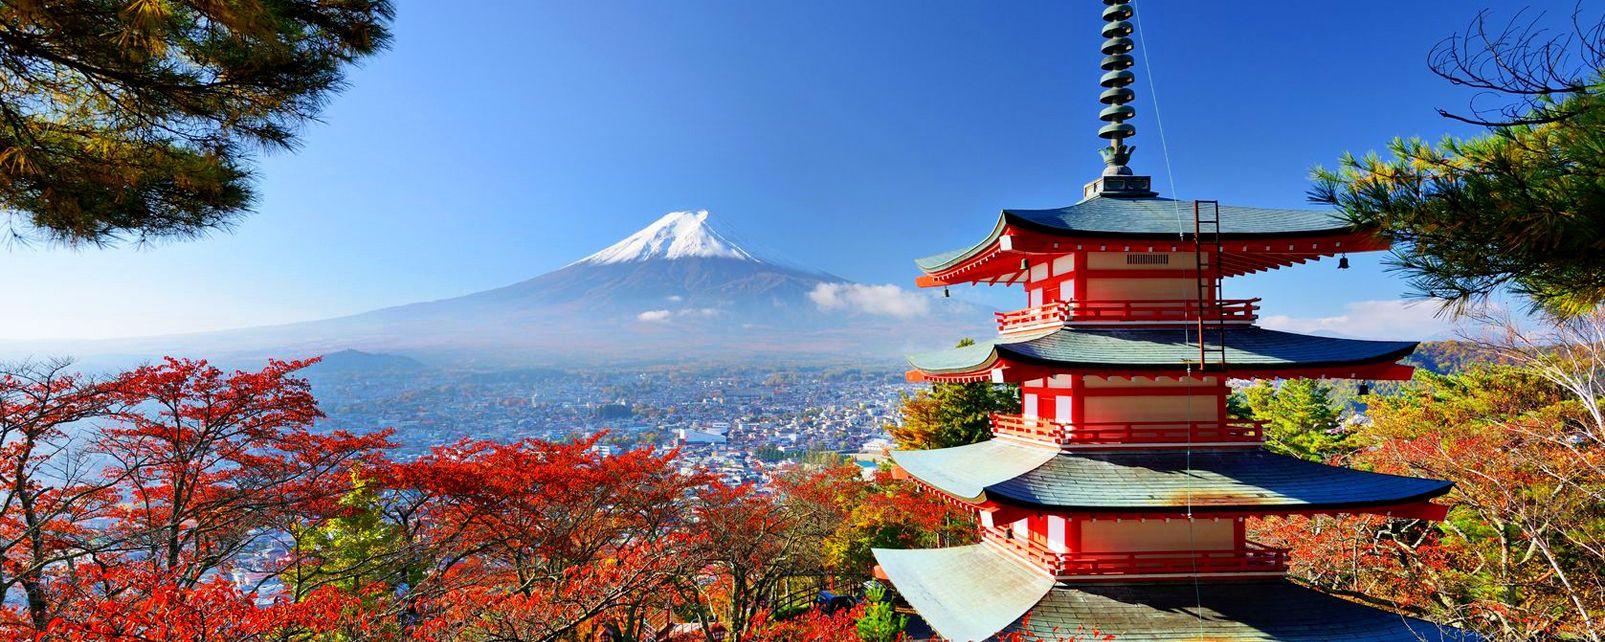 Il monte Fuji , Il monte Fuji, Giappone , Giappone